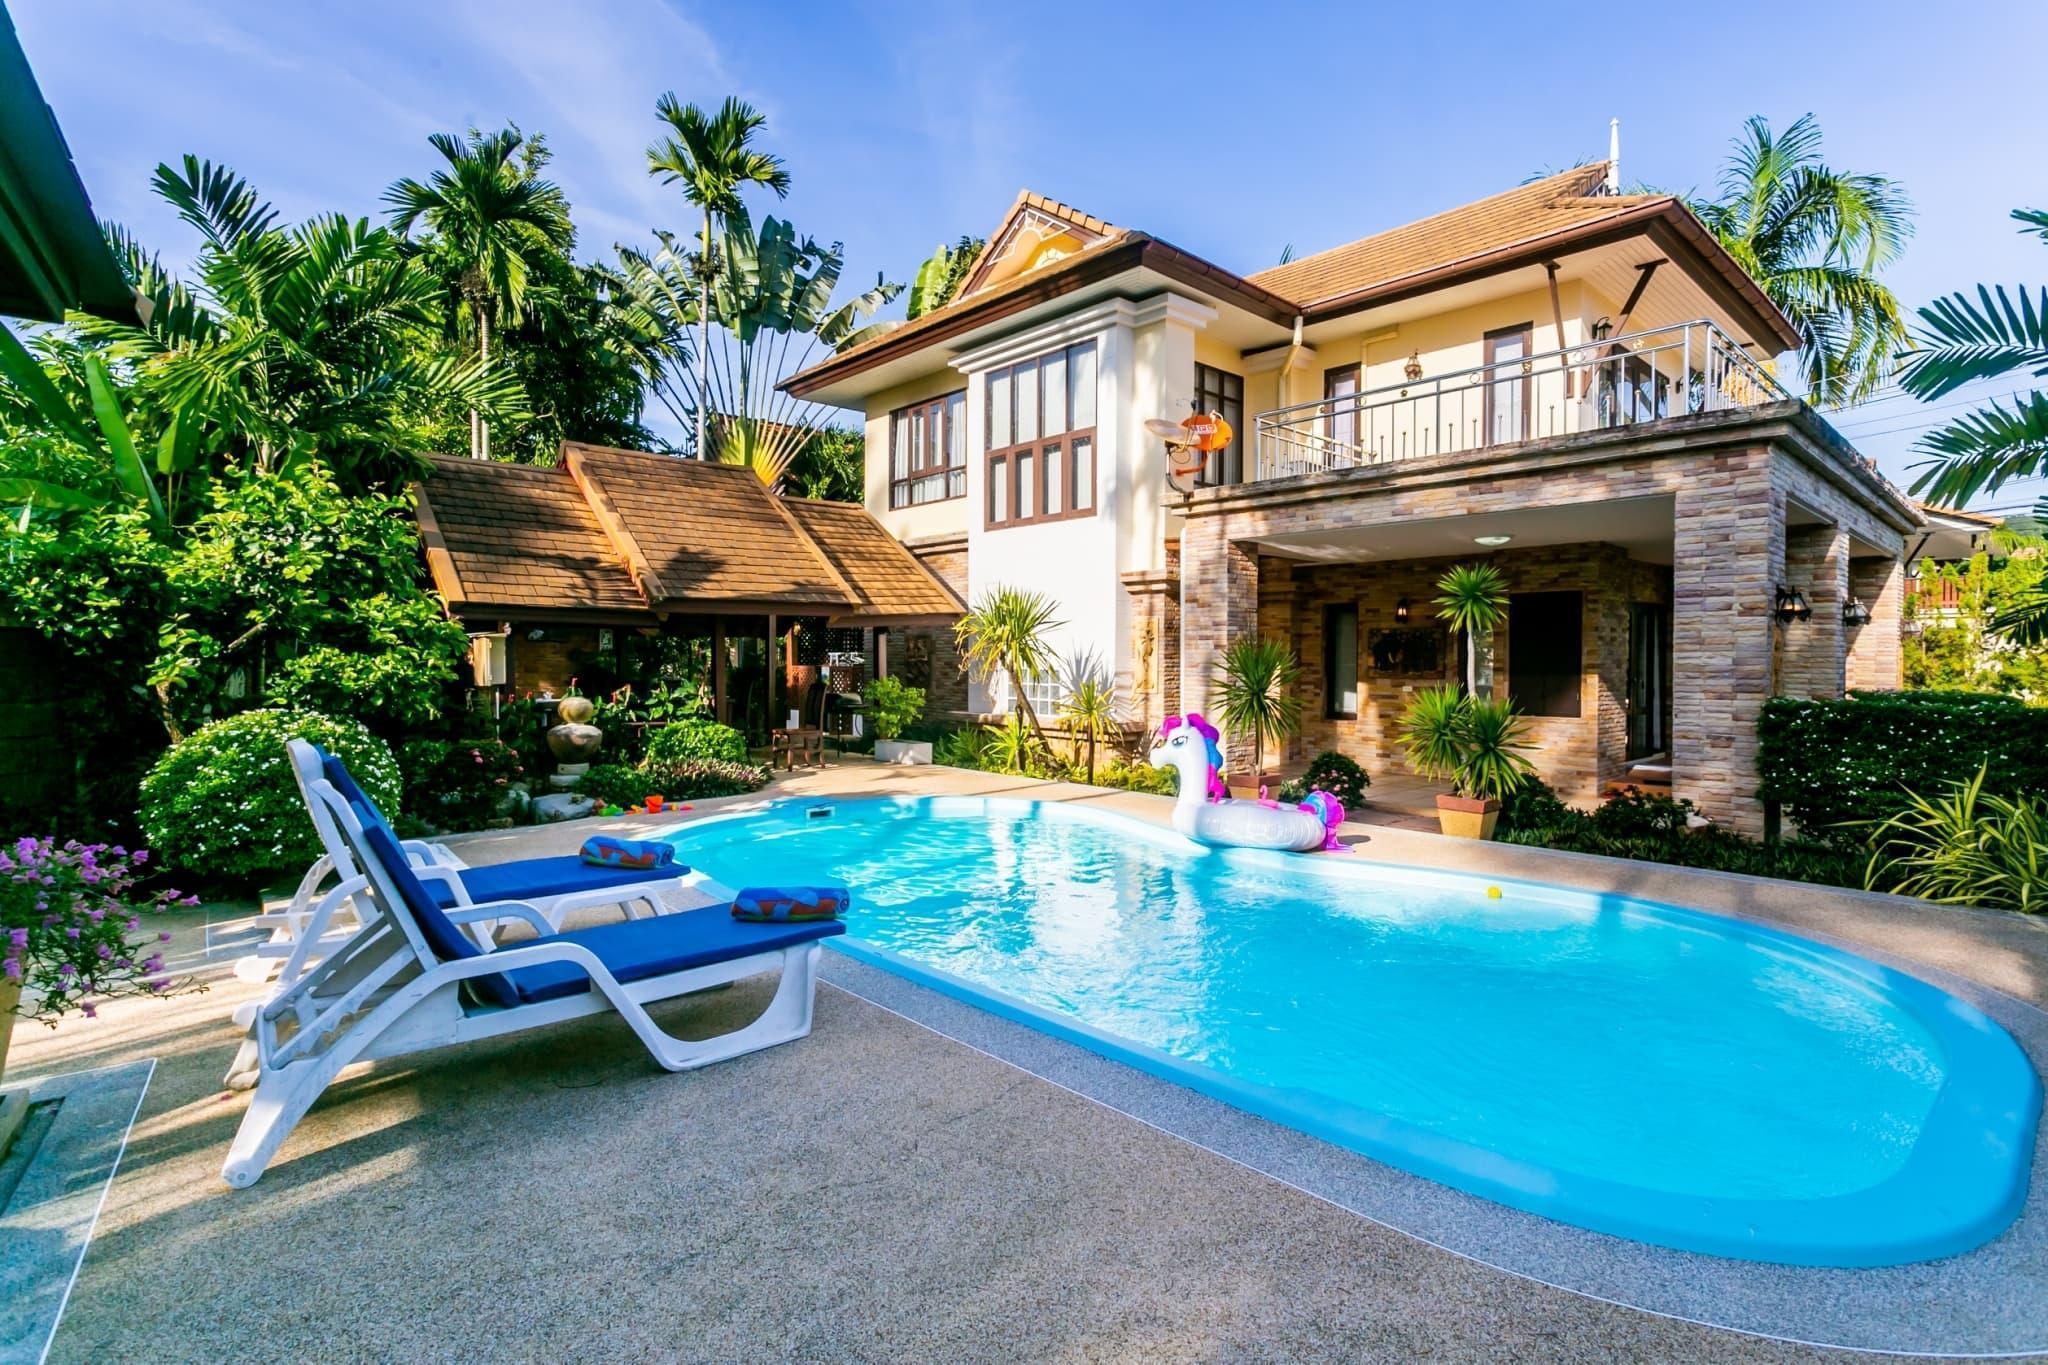 private poolvilla luno 30 วิลลา 3 ห้องนอน 2 ห้องน้ำส่วนตัว ขนาด 120 ตร.ม. – นพรัตน์ธารา